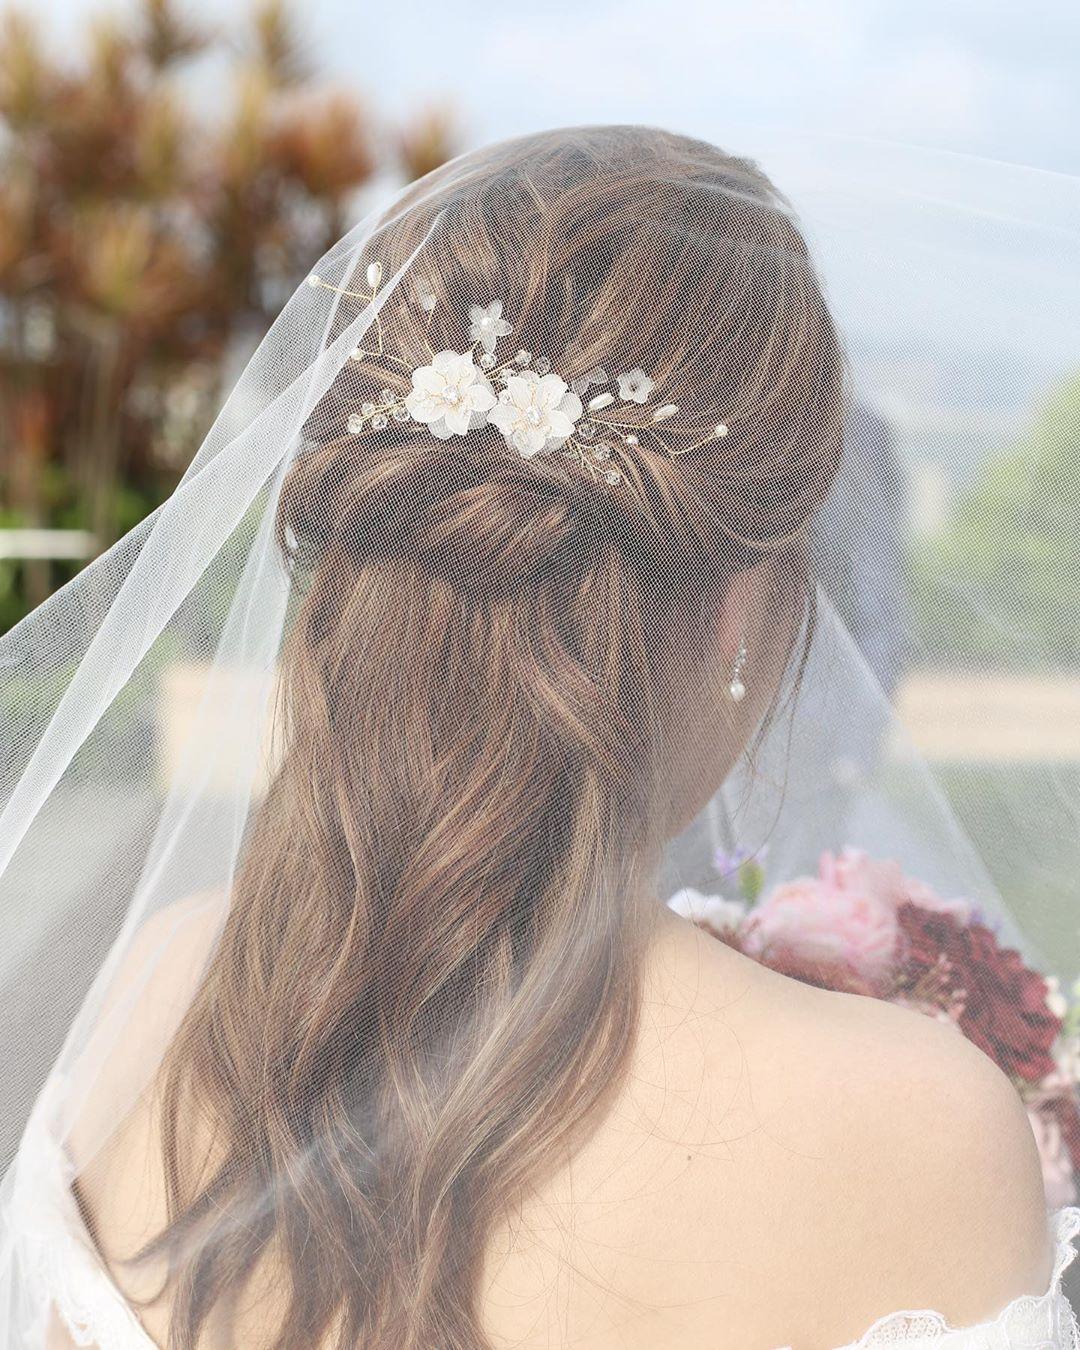 اجمل موديلات تساريح عروس لهذا الصيف